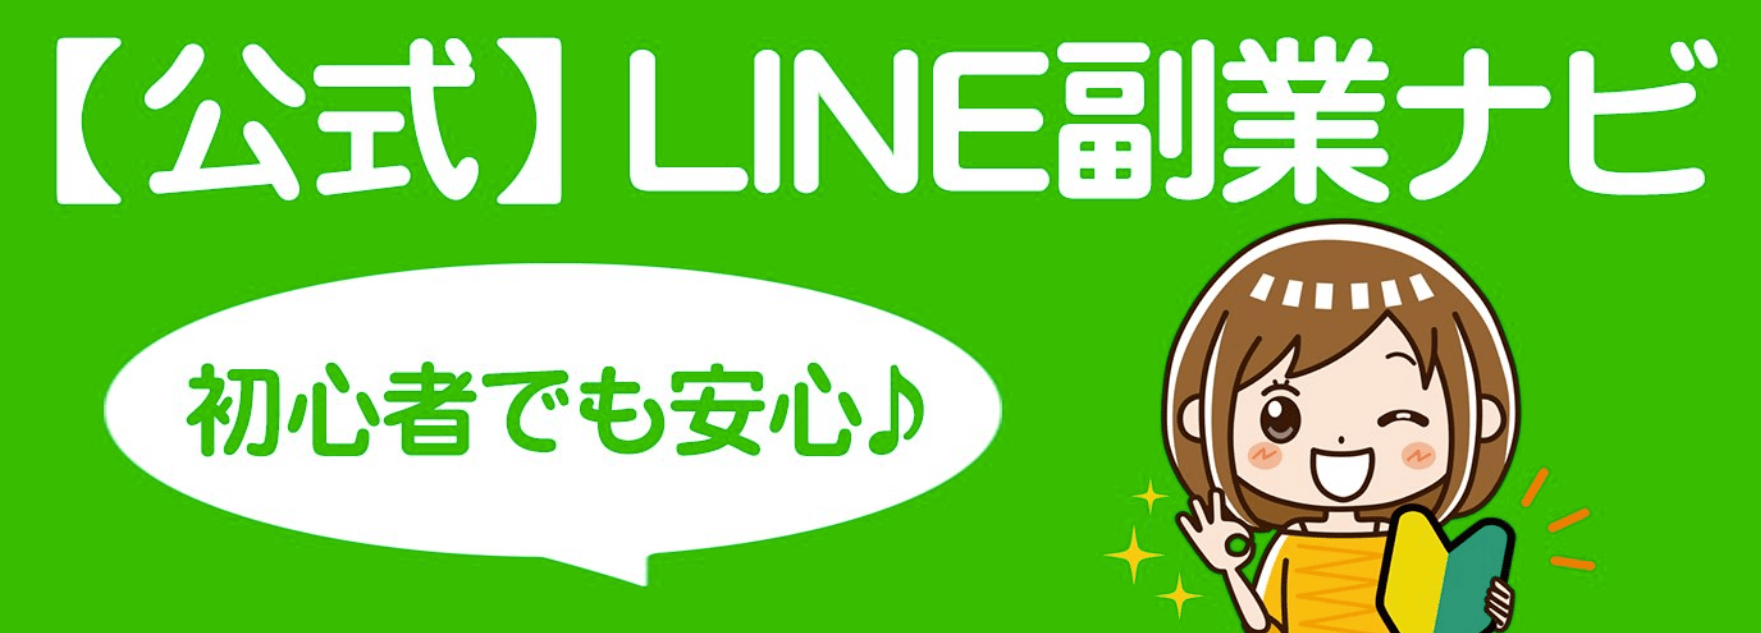 LINE副業ナビ